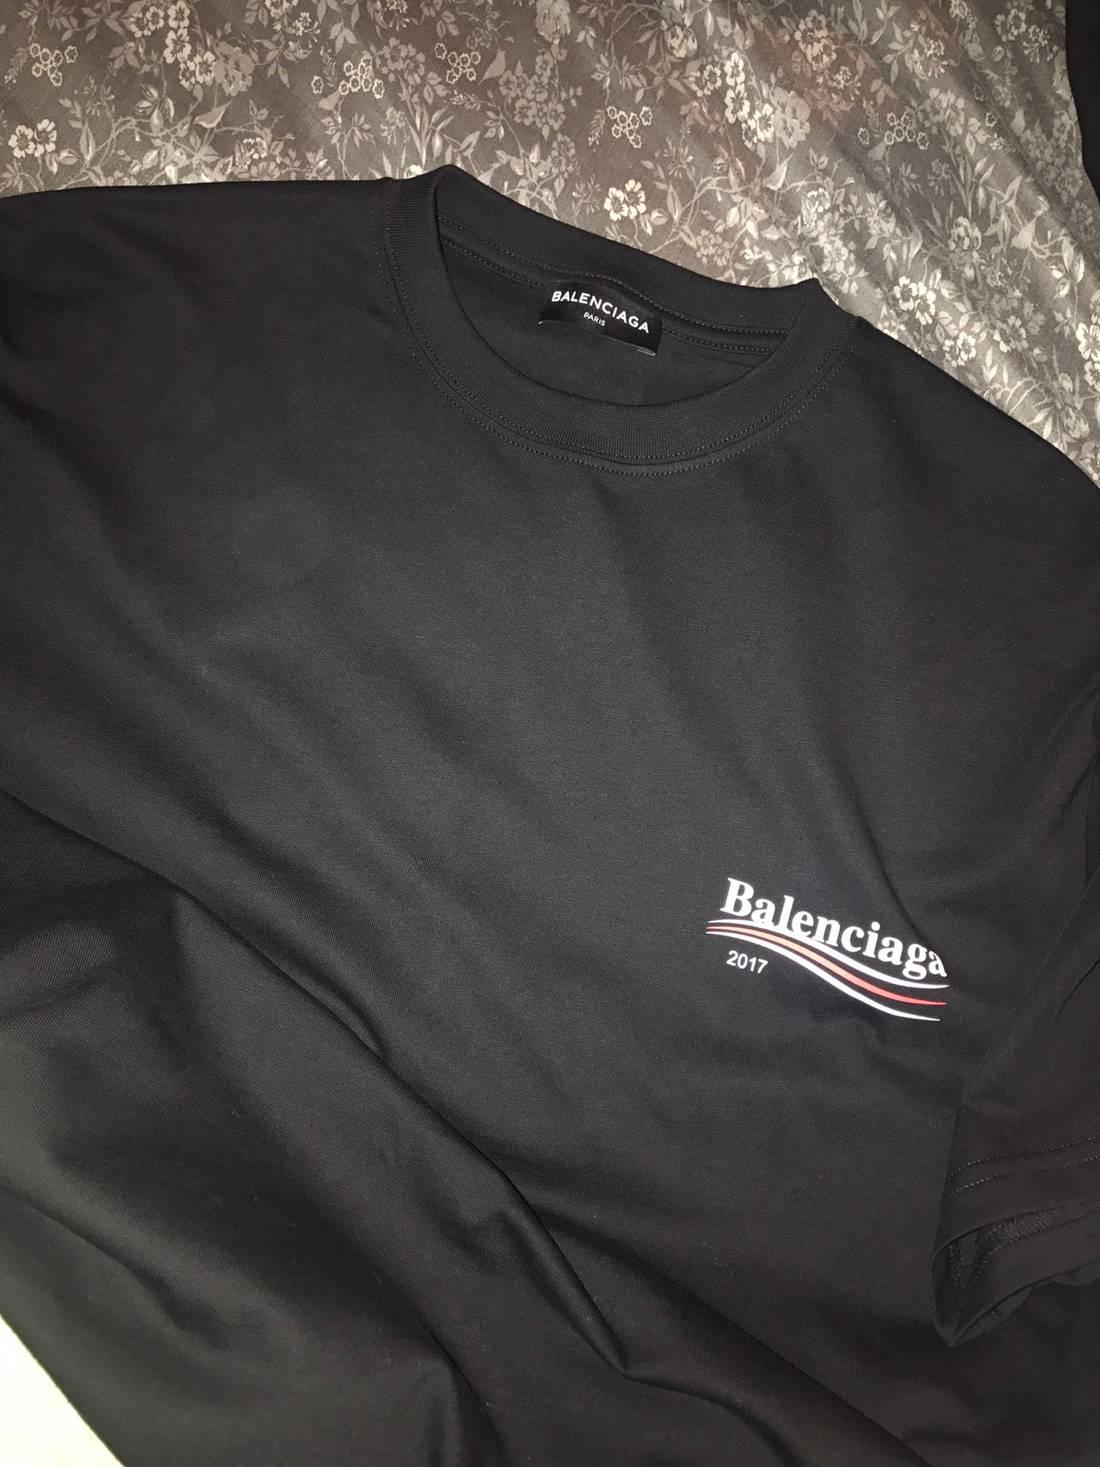 3509057ceb6e Balenciaga T Shirt Mens 2017